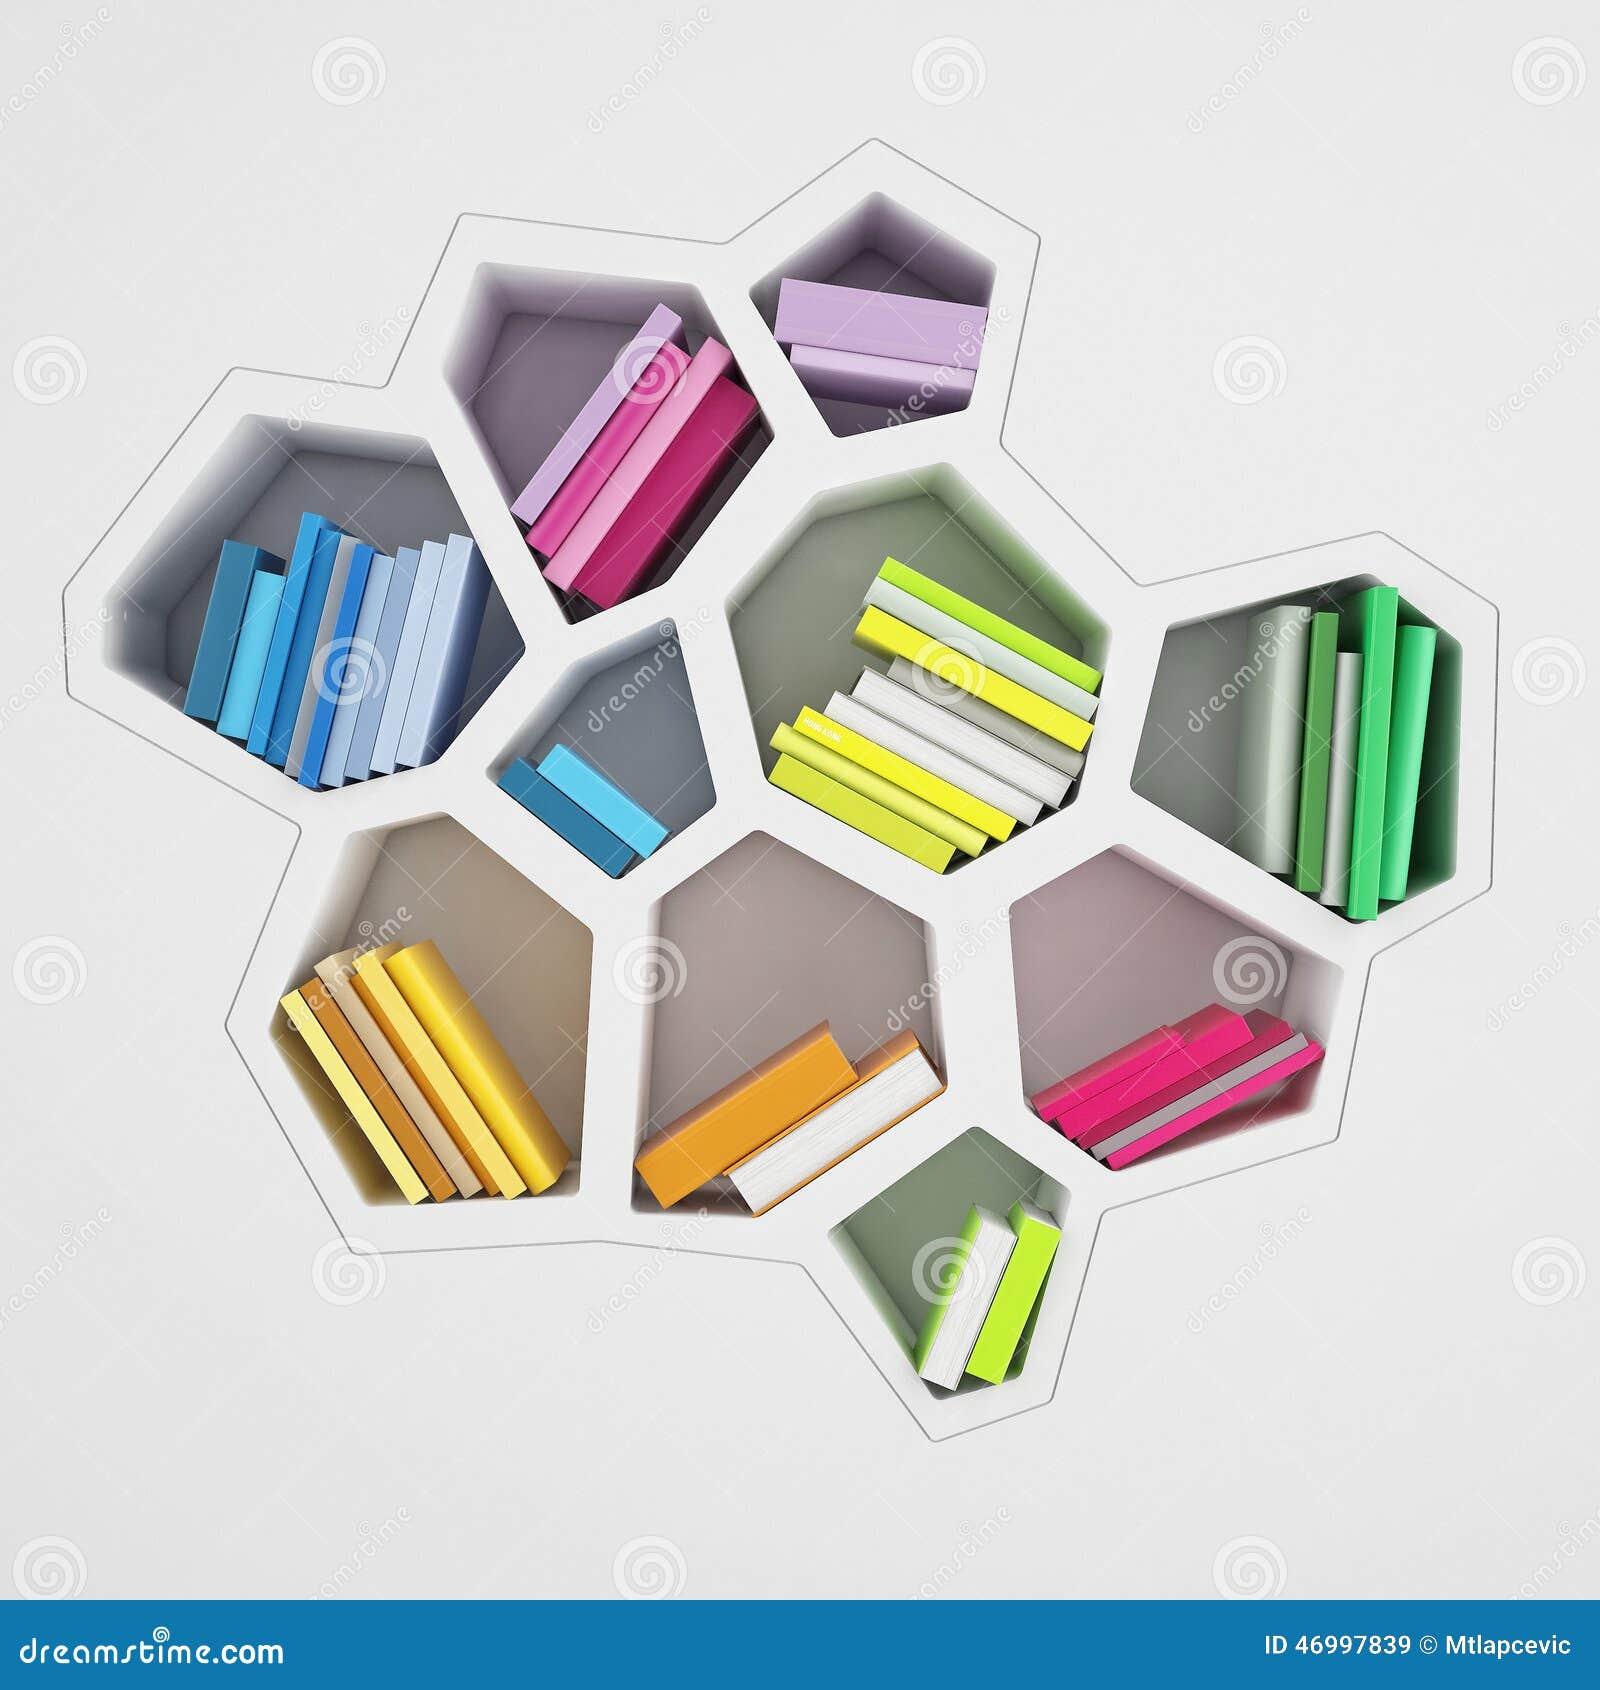 Abstract Hexagonal Shelf Full Of Multicolored Books